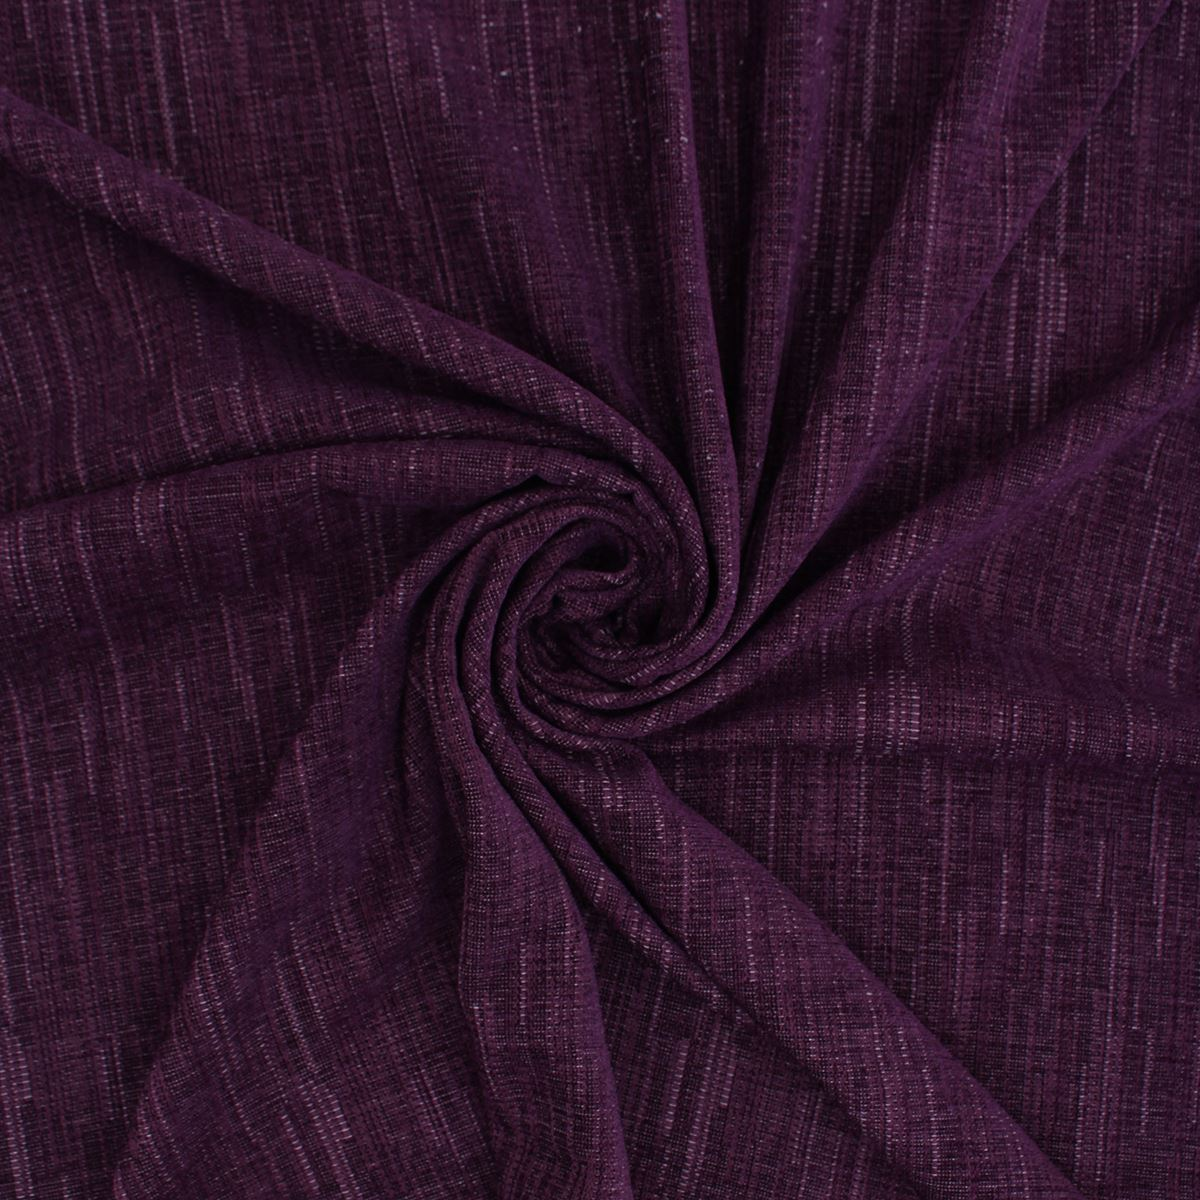 034-Chenille-034-Slubbed-Shabby-Worn-Look-Curtain-Cushion-Sofa-Upholstery-Fabric thumbnail 42